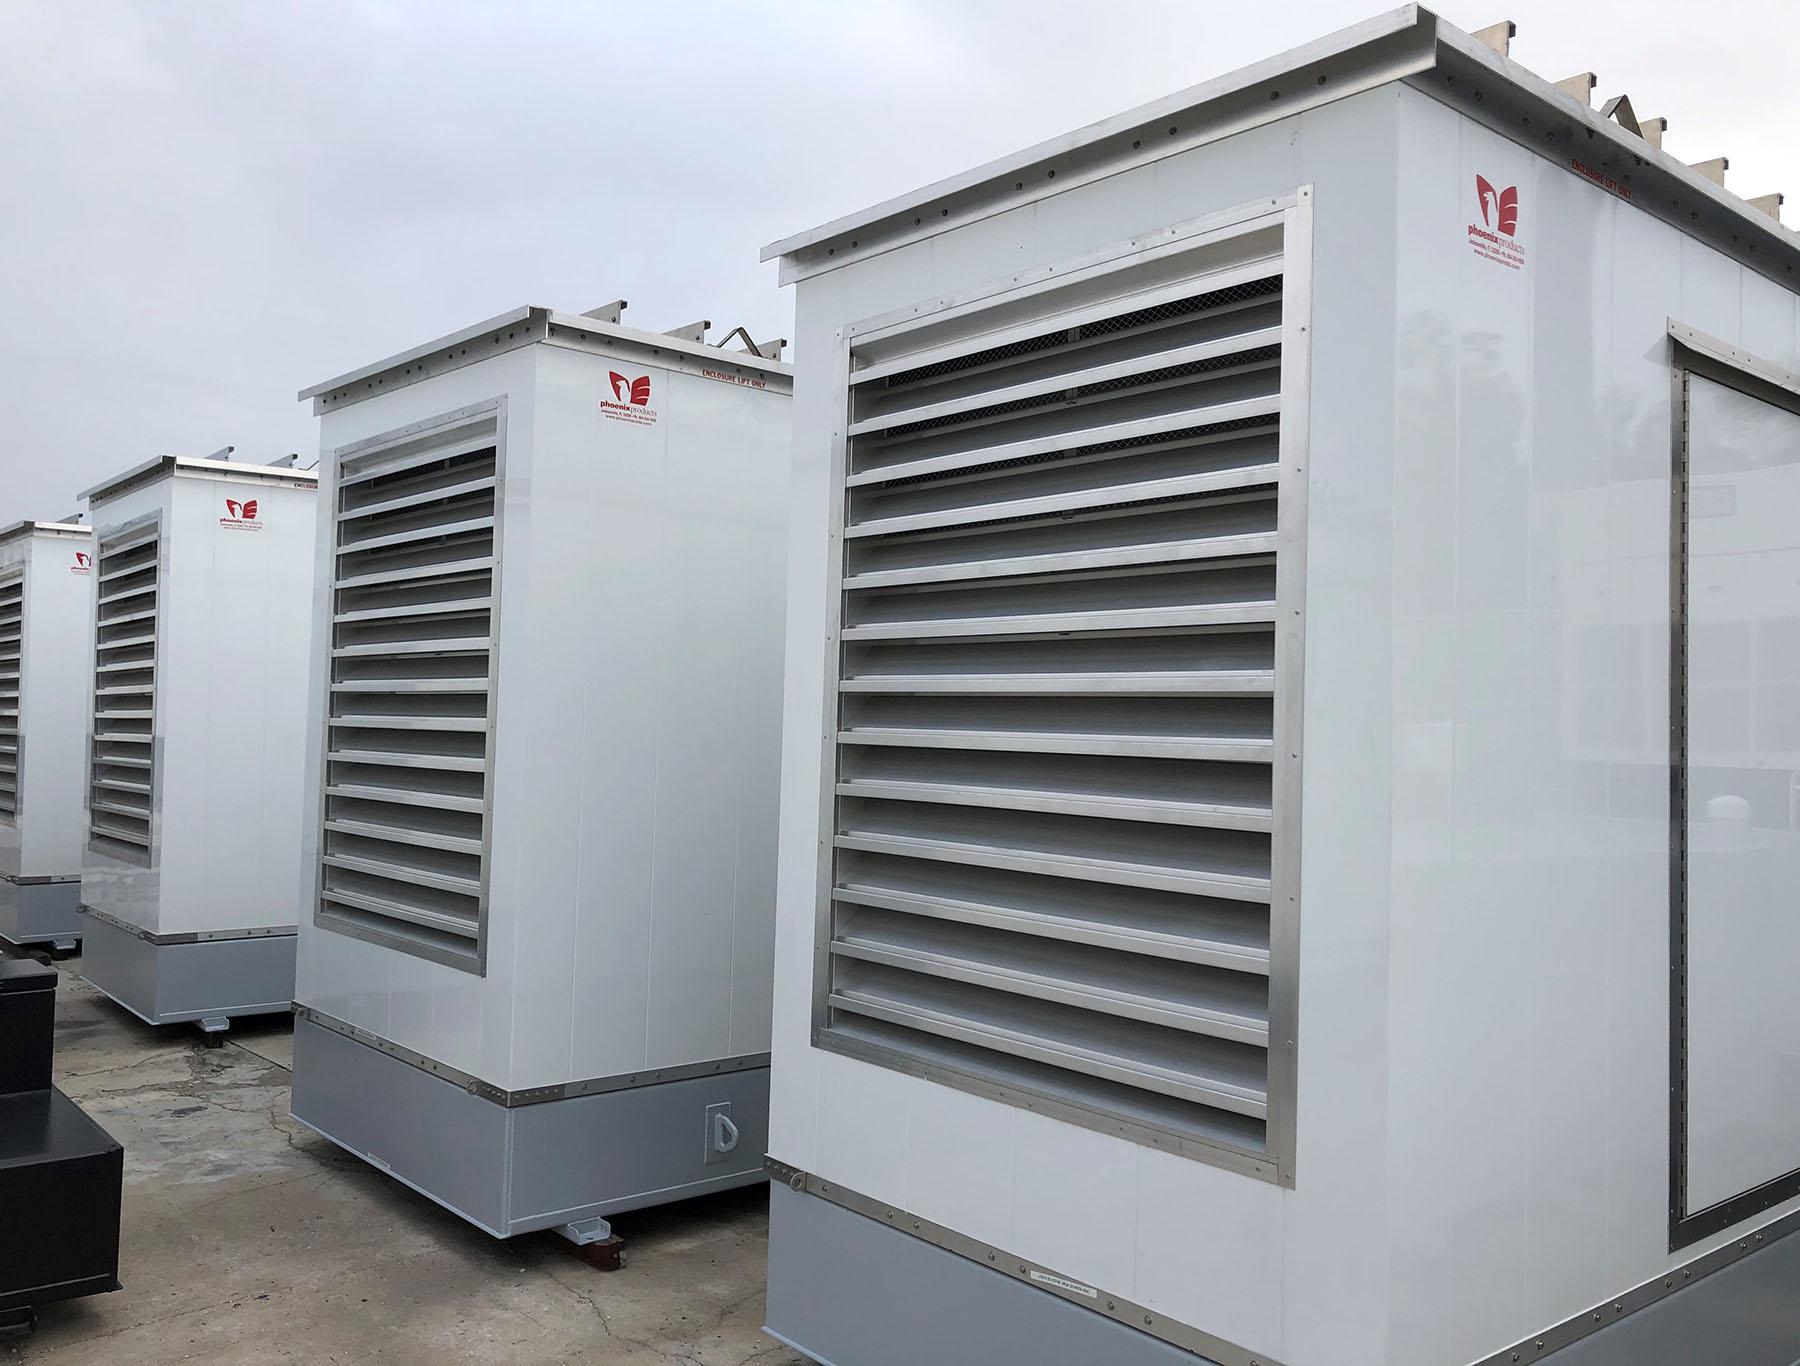 Phoenix-Products-Custom-Aluminum-Generator-Enclosures-With-Sub-Base-Fuel-Tanks